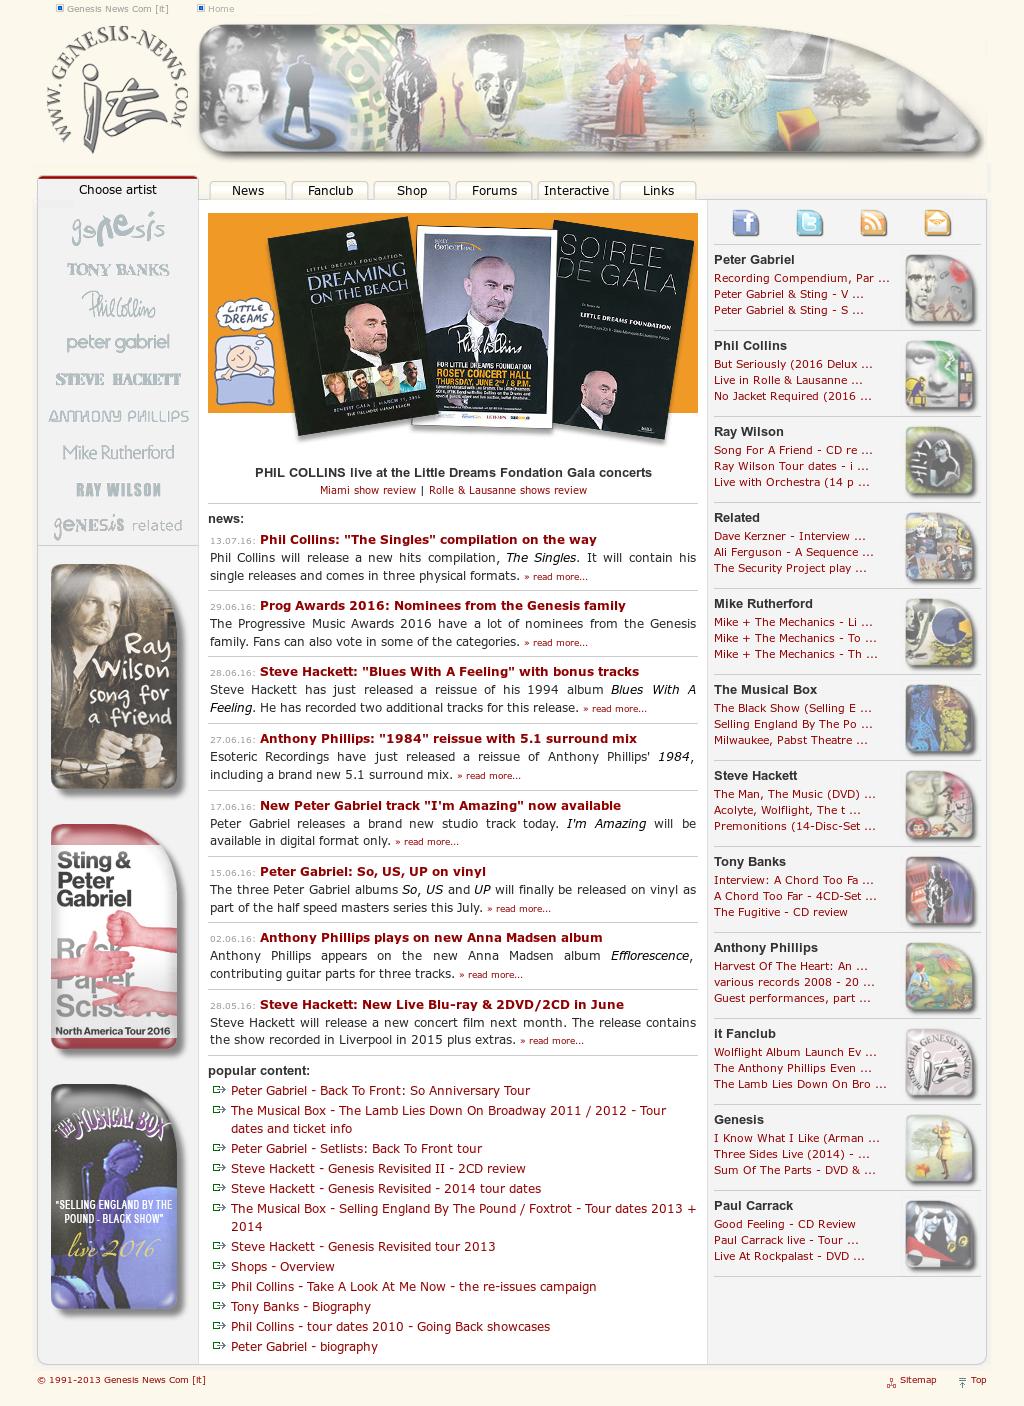 Genesis News Com Competitors, Revenue and Employees - Owler